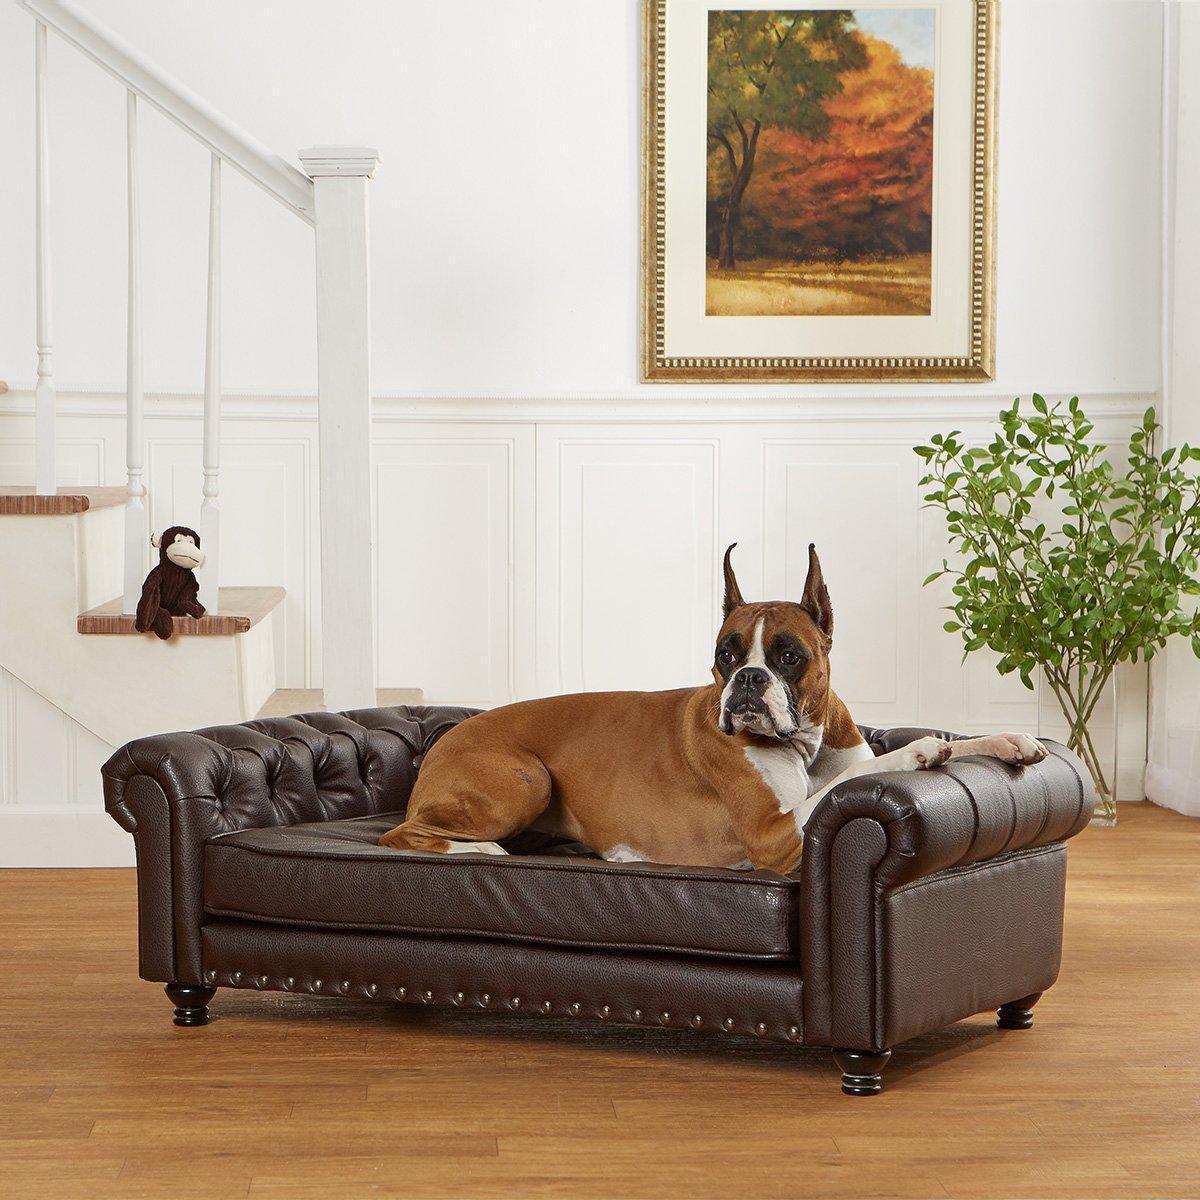 Big dog on the leather sofa